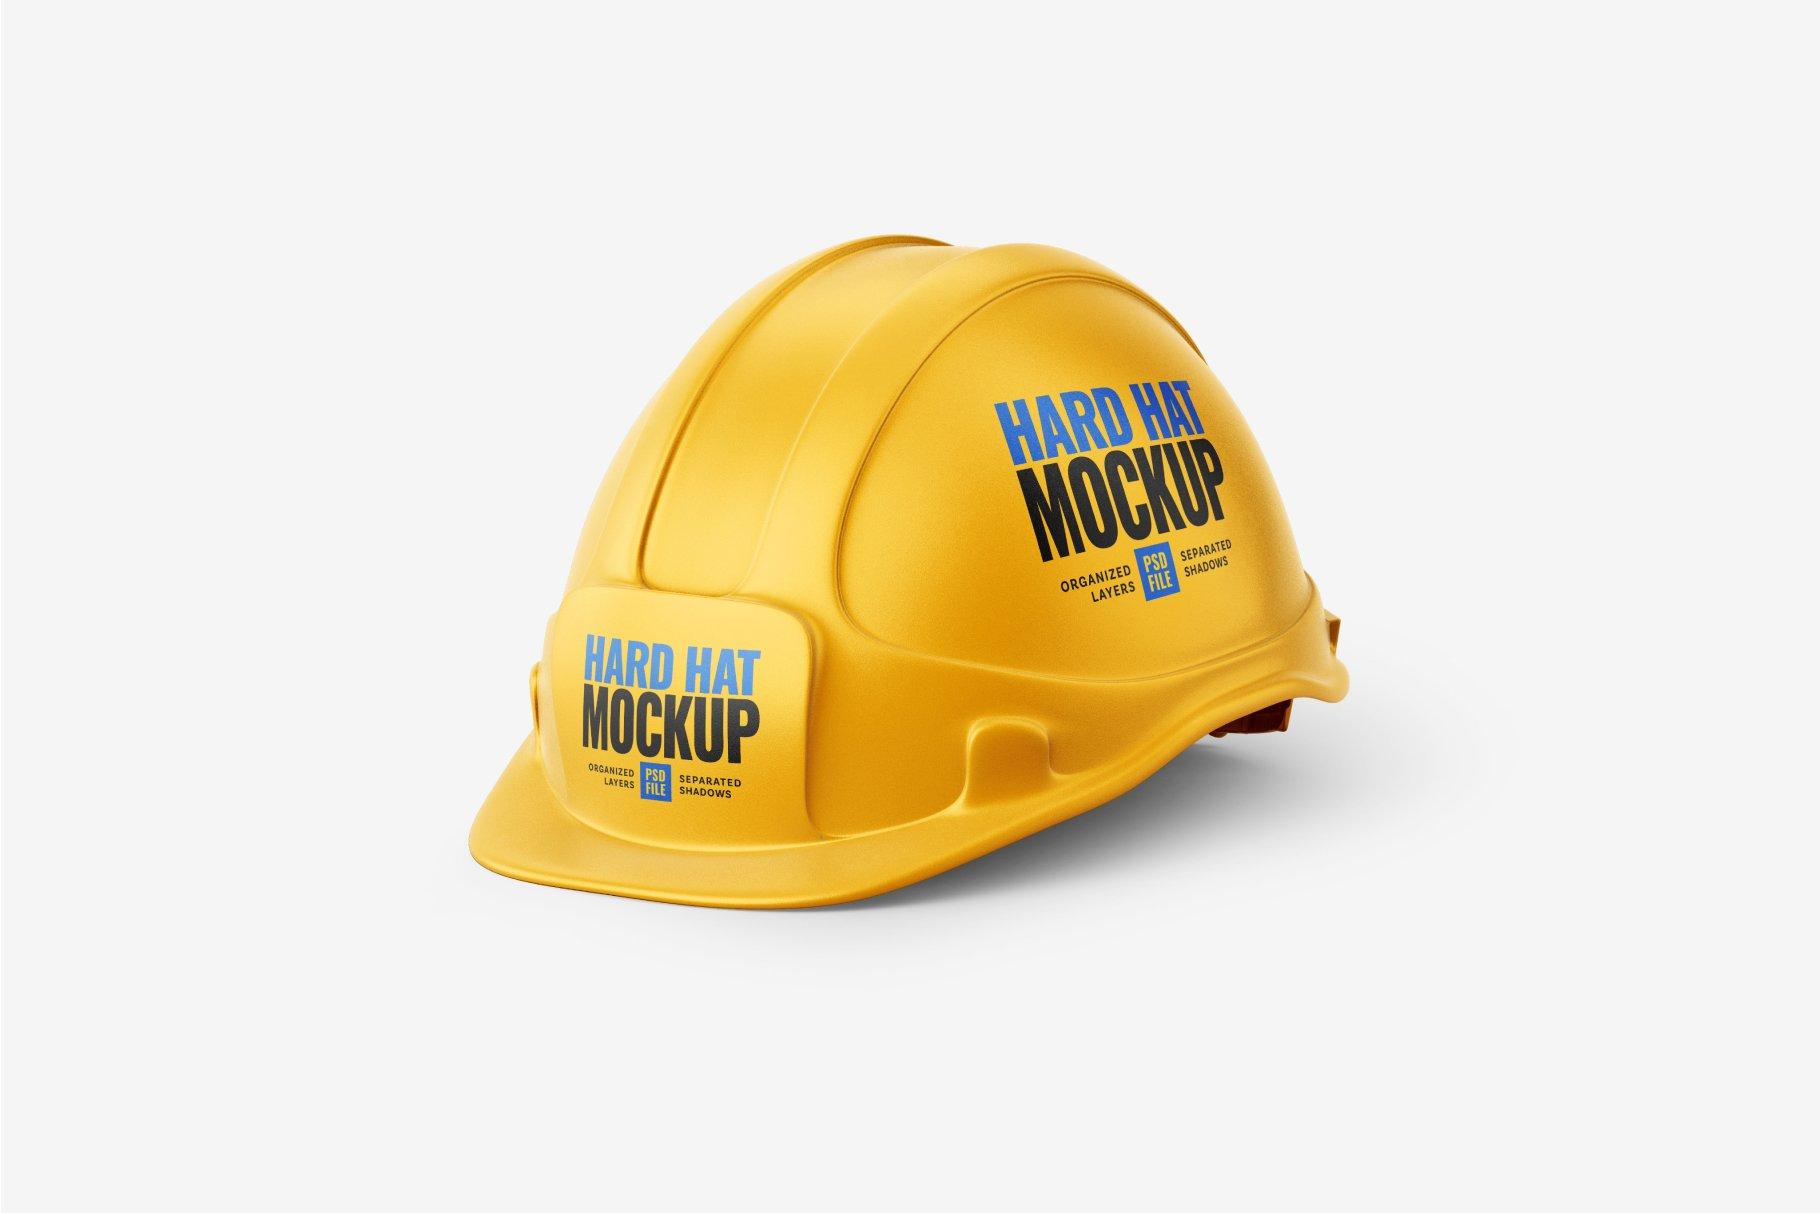 8款逼真工程安全帽头盔设计样机PSD模板素材 Construction Hard Hat Mockup Set插图7